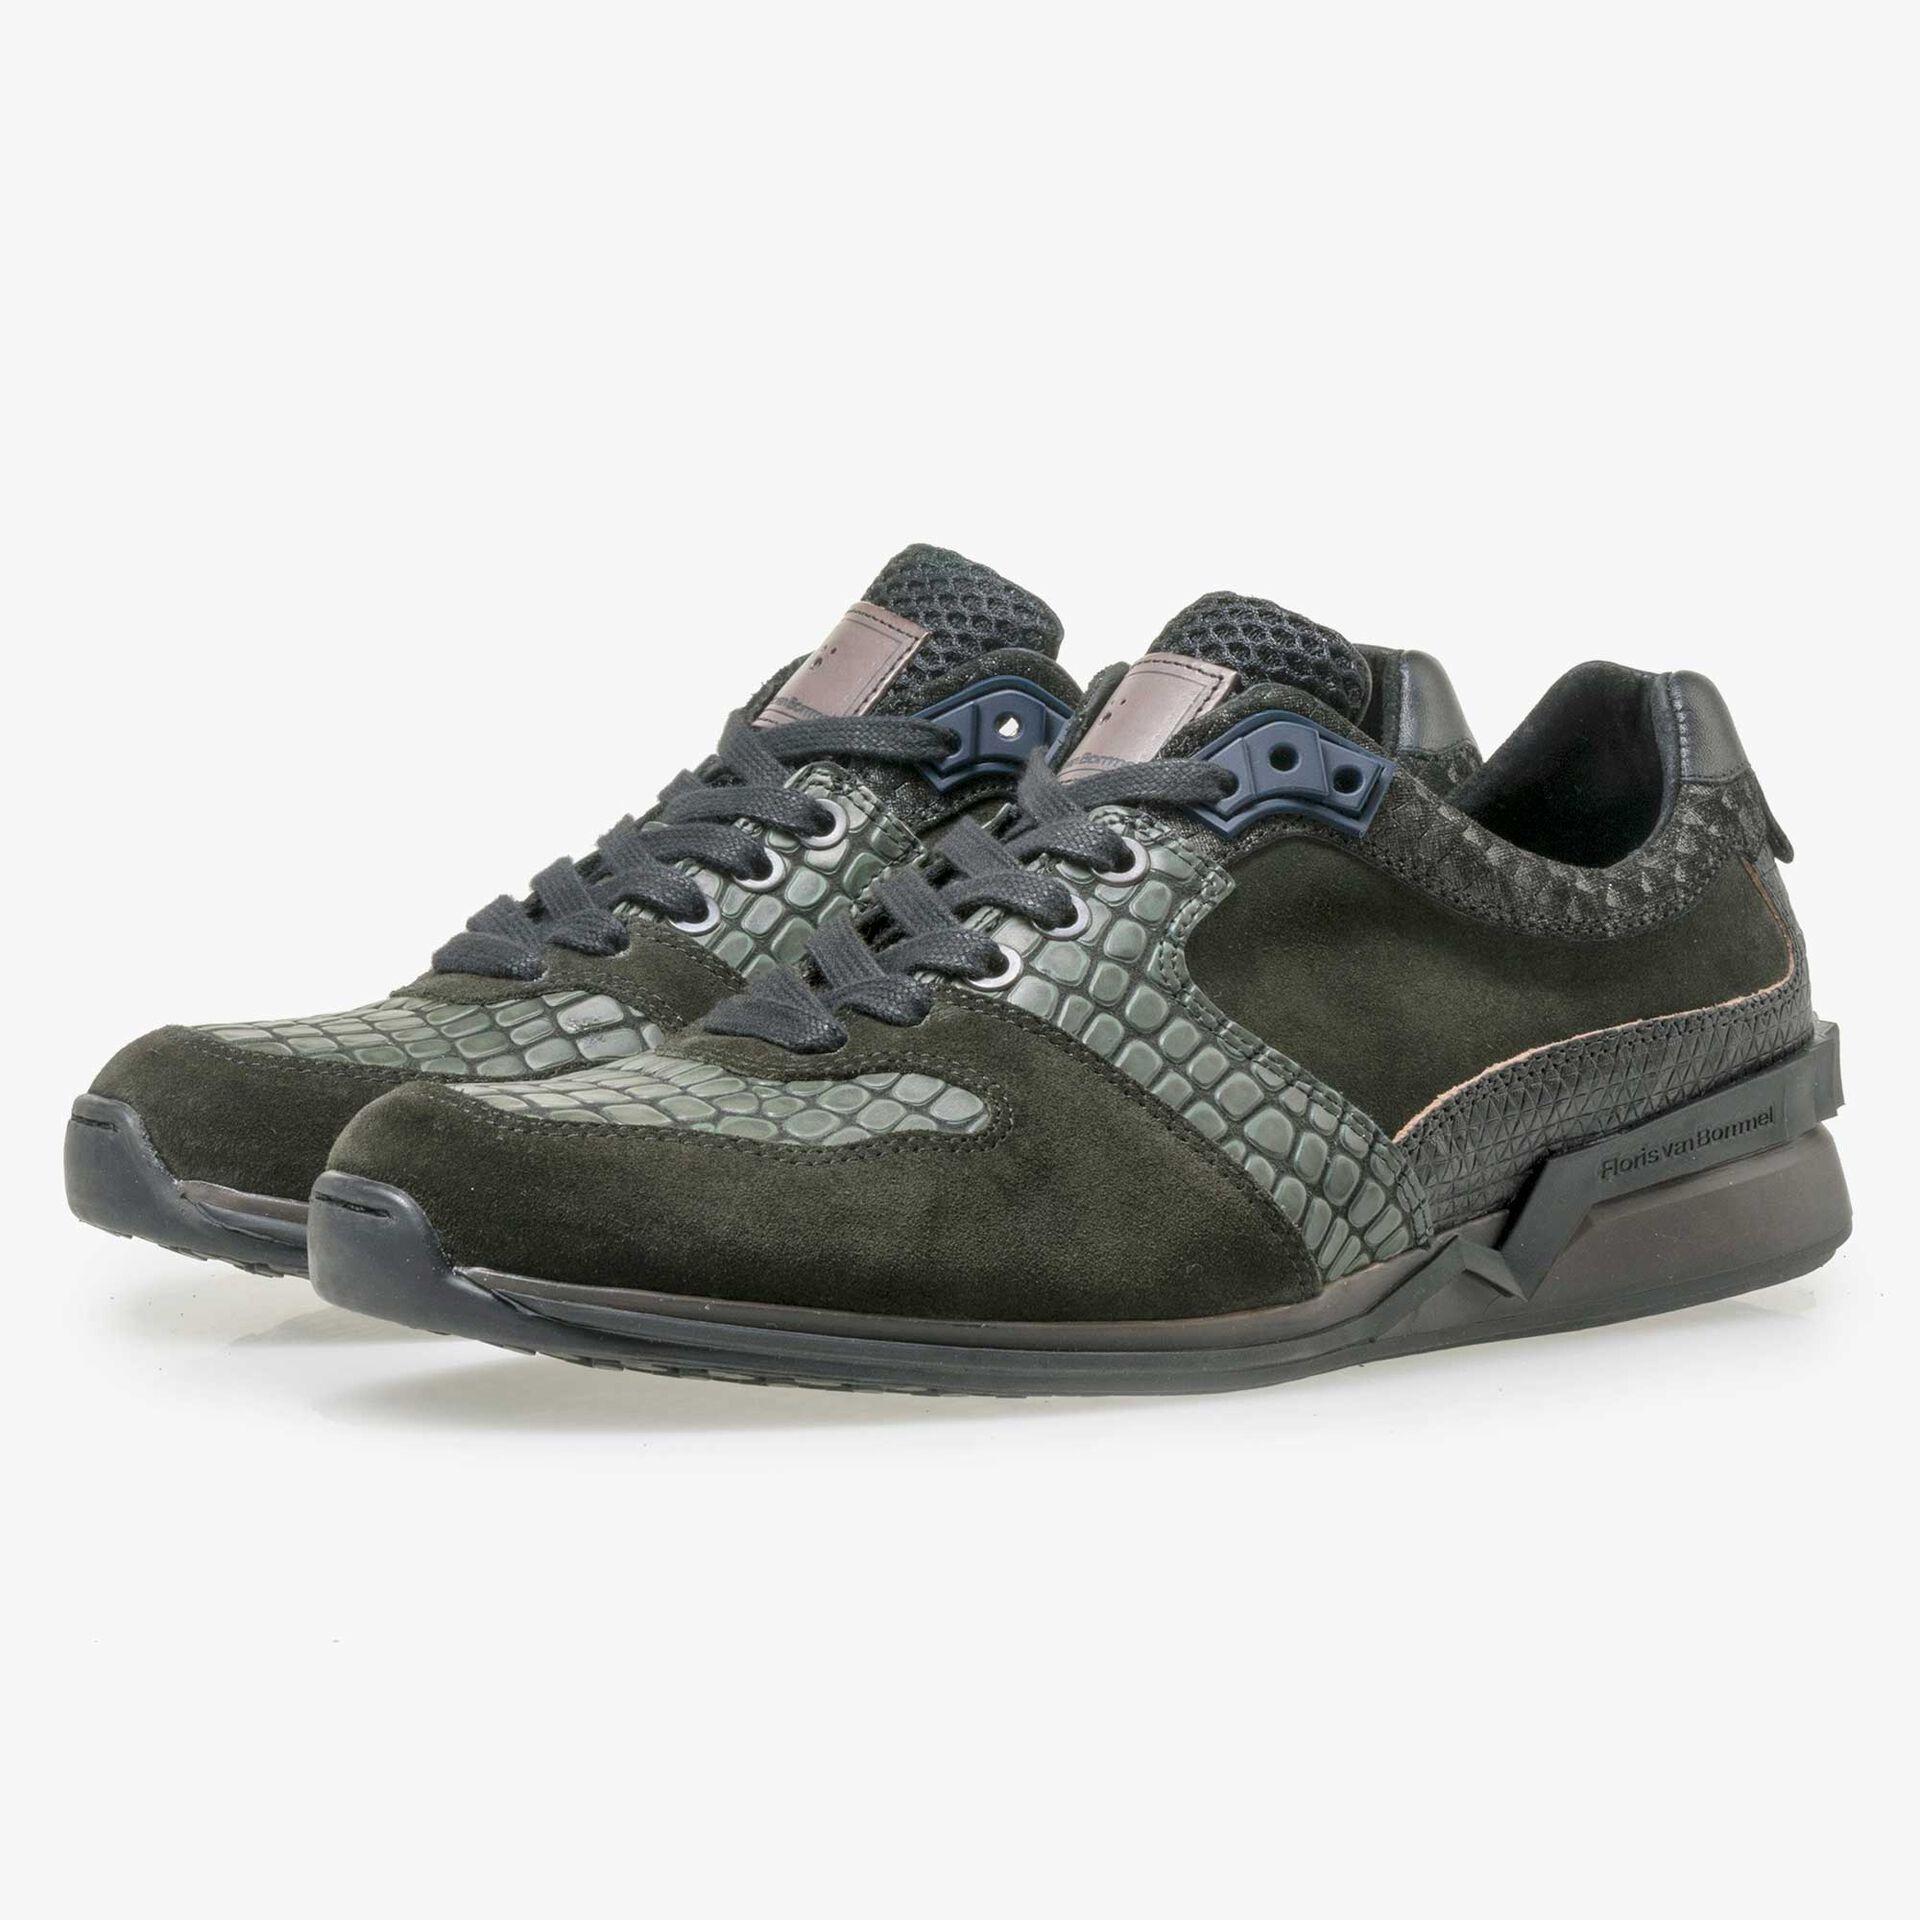 Floris van Bommel Premium olive green leather sneaker